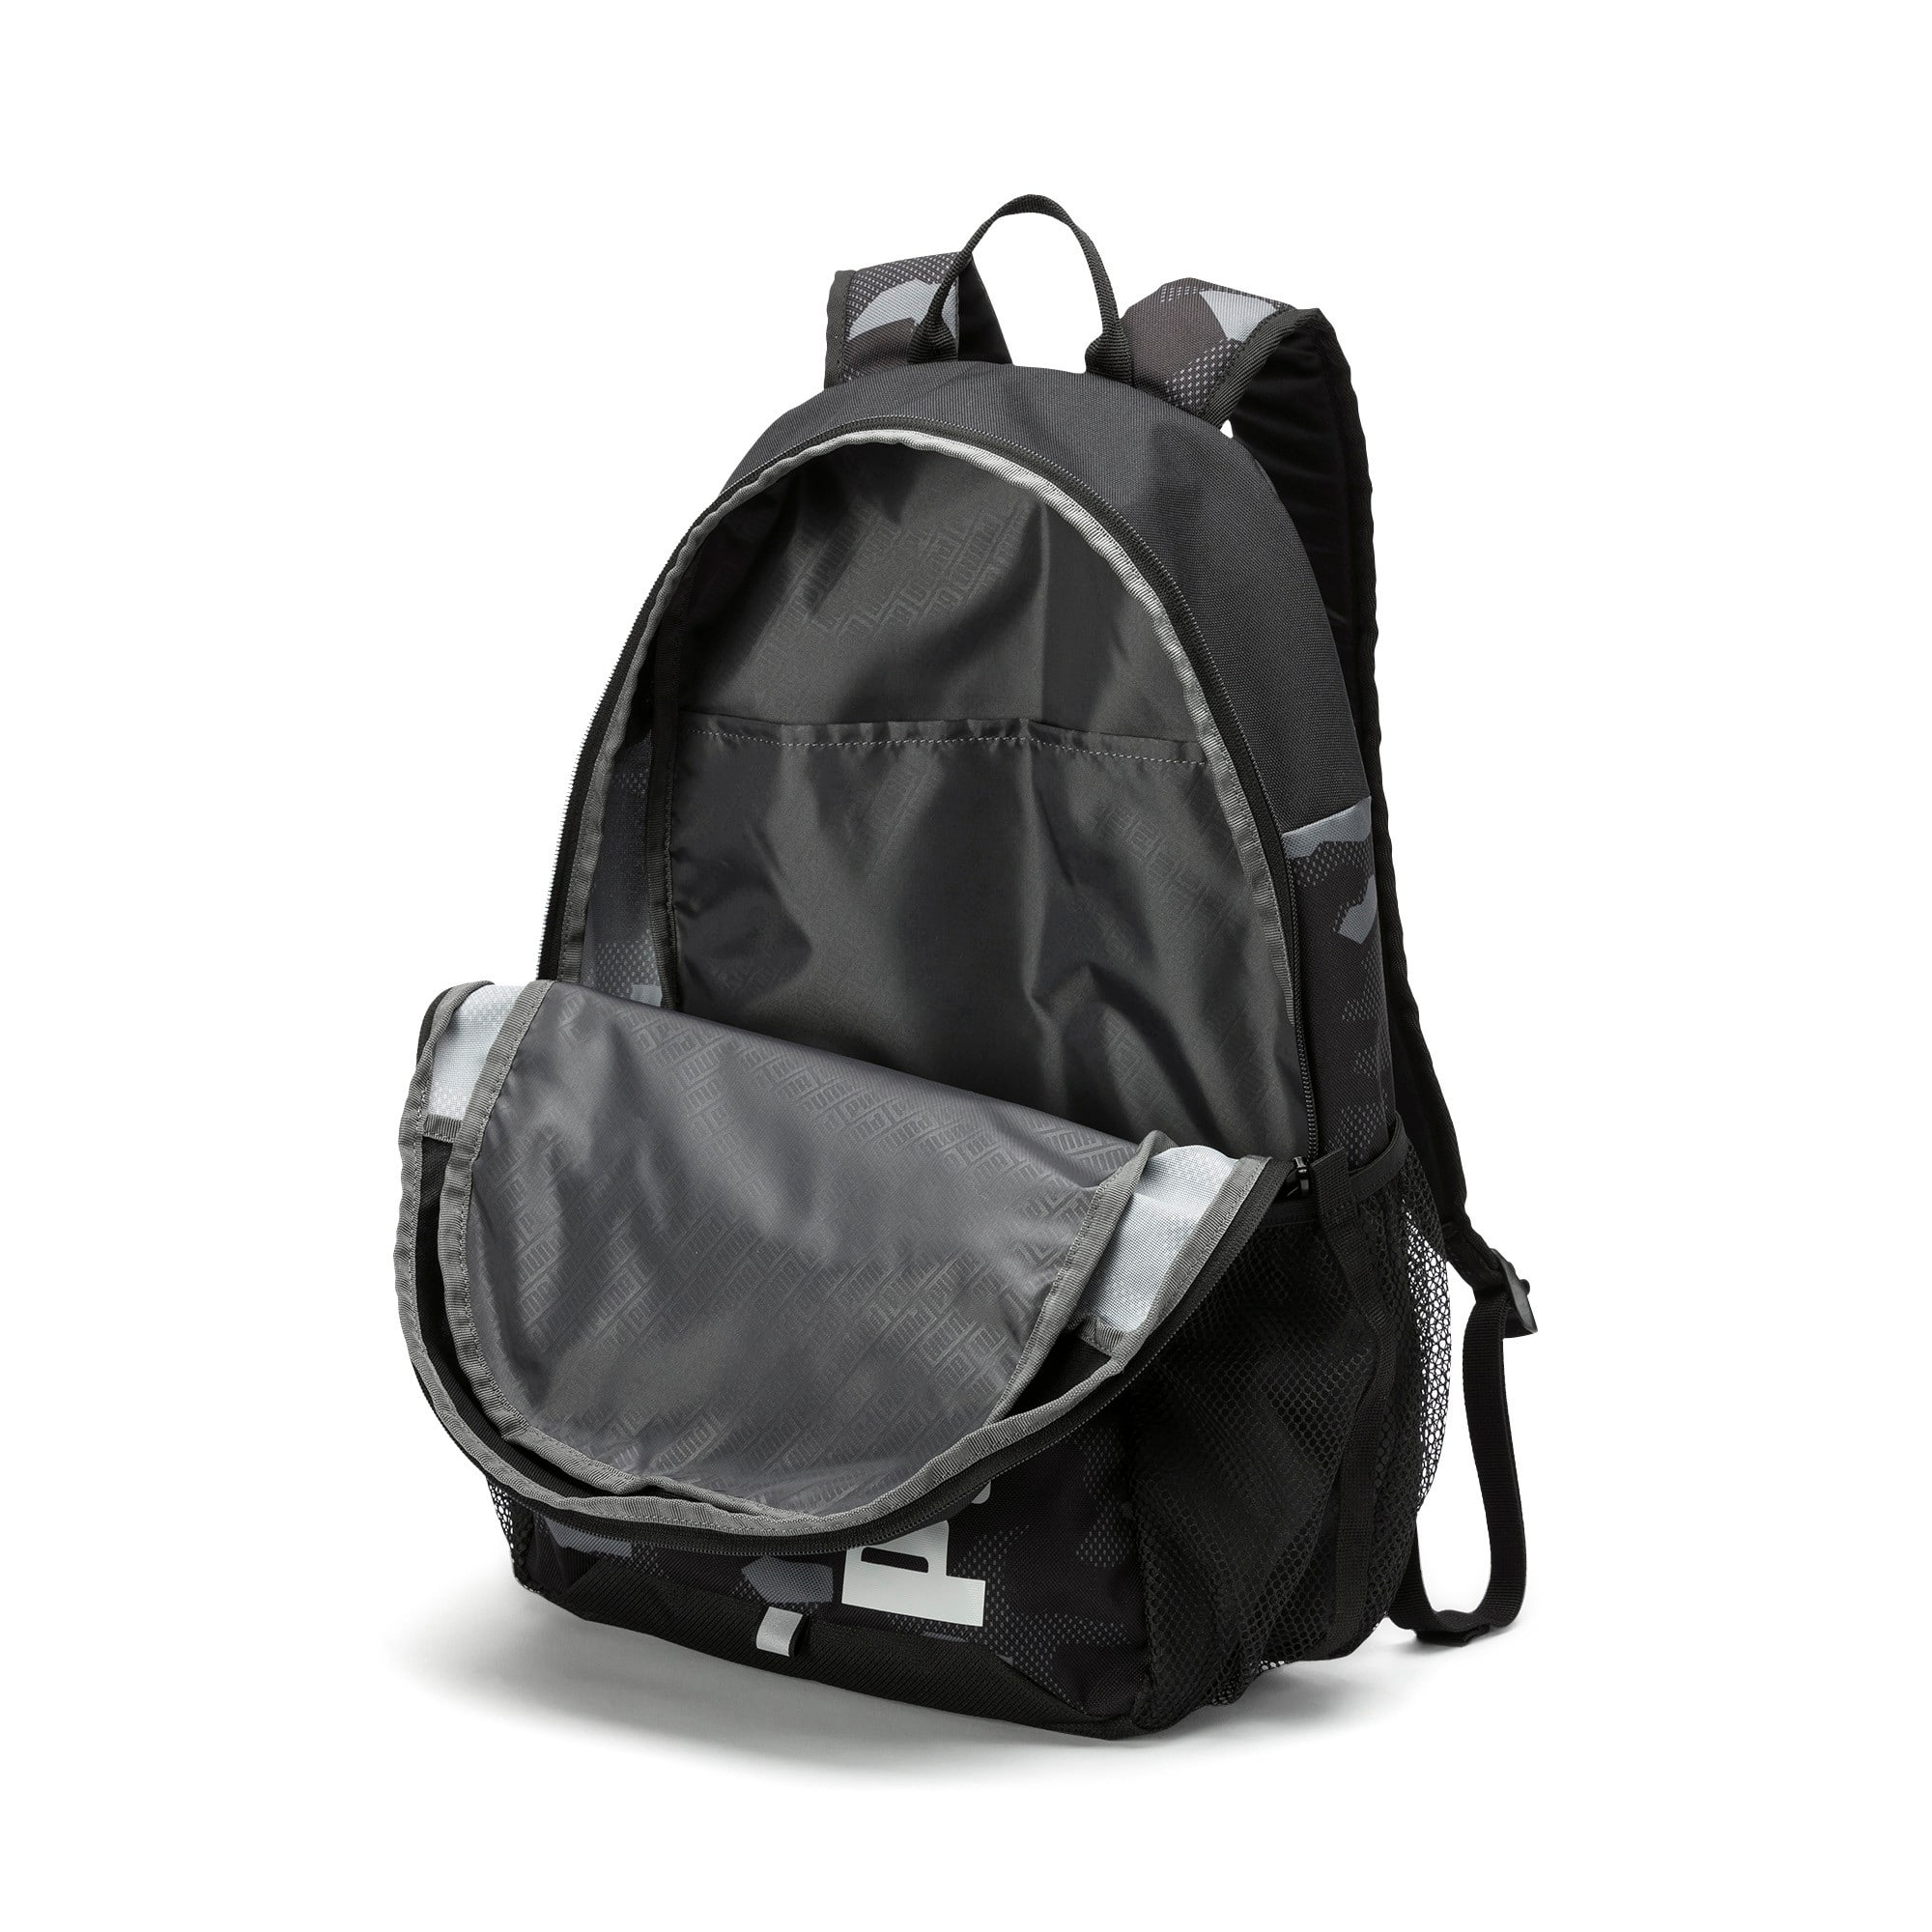 Thumbnail 3 of PUMA Style Backpack, Puma Black-Camo AOP, medium